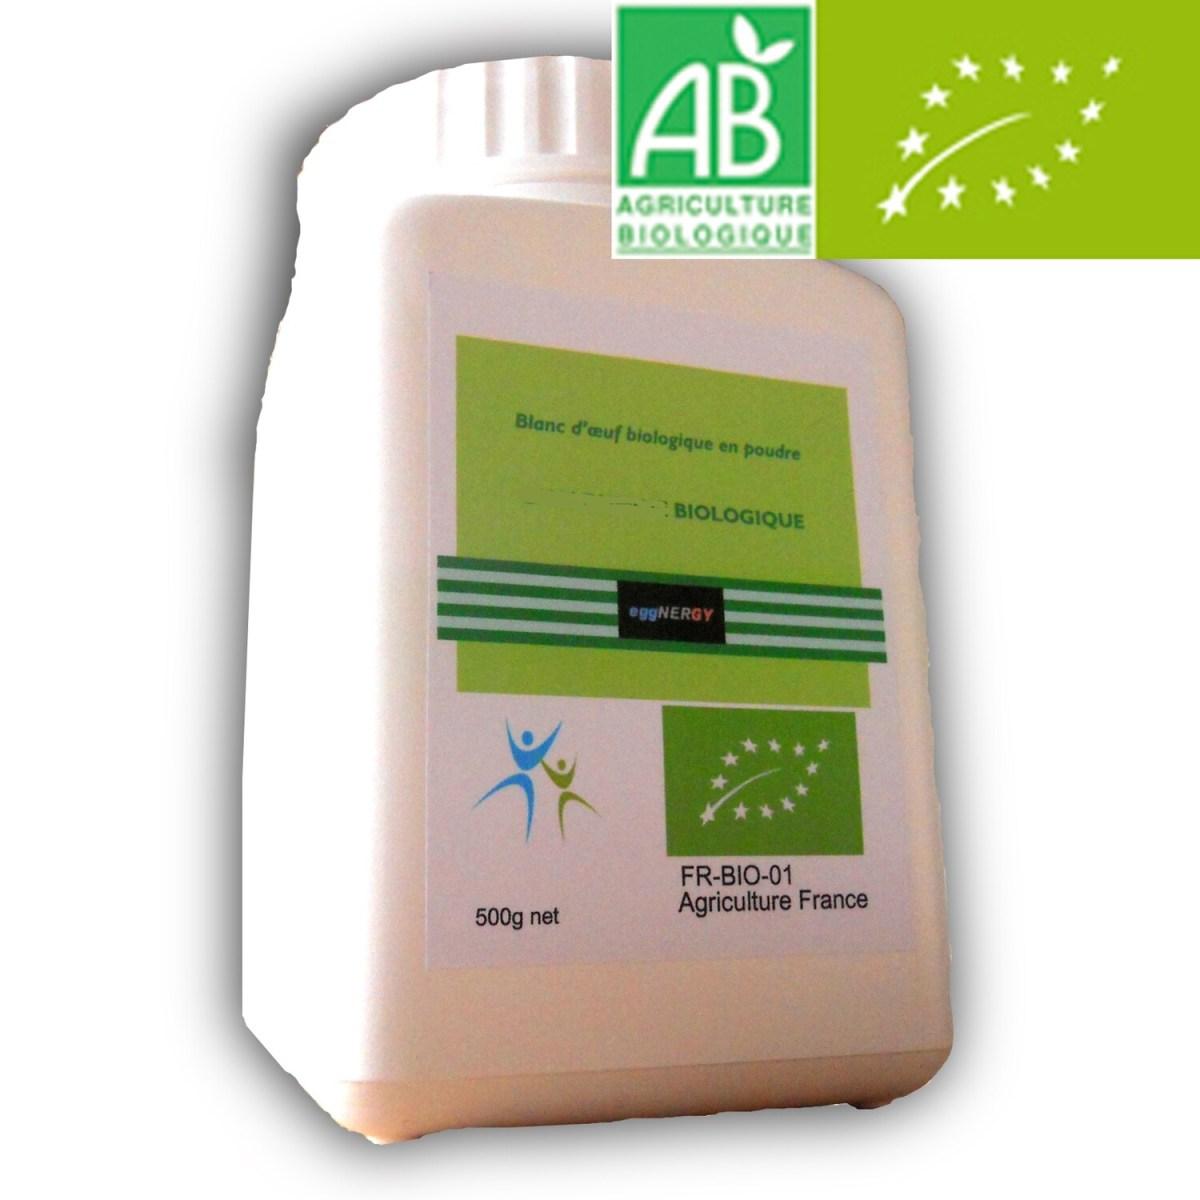 500 g Bio Code 0 Blanc d'œuf poudre.